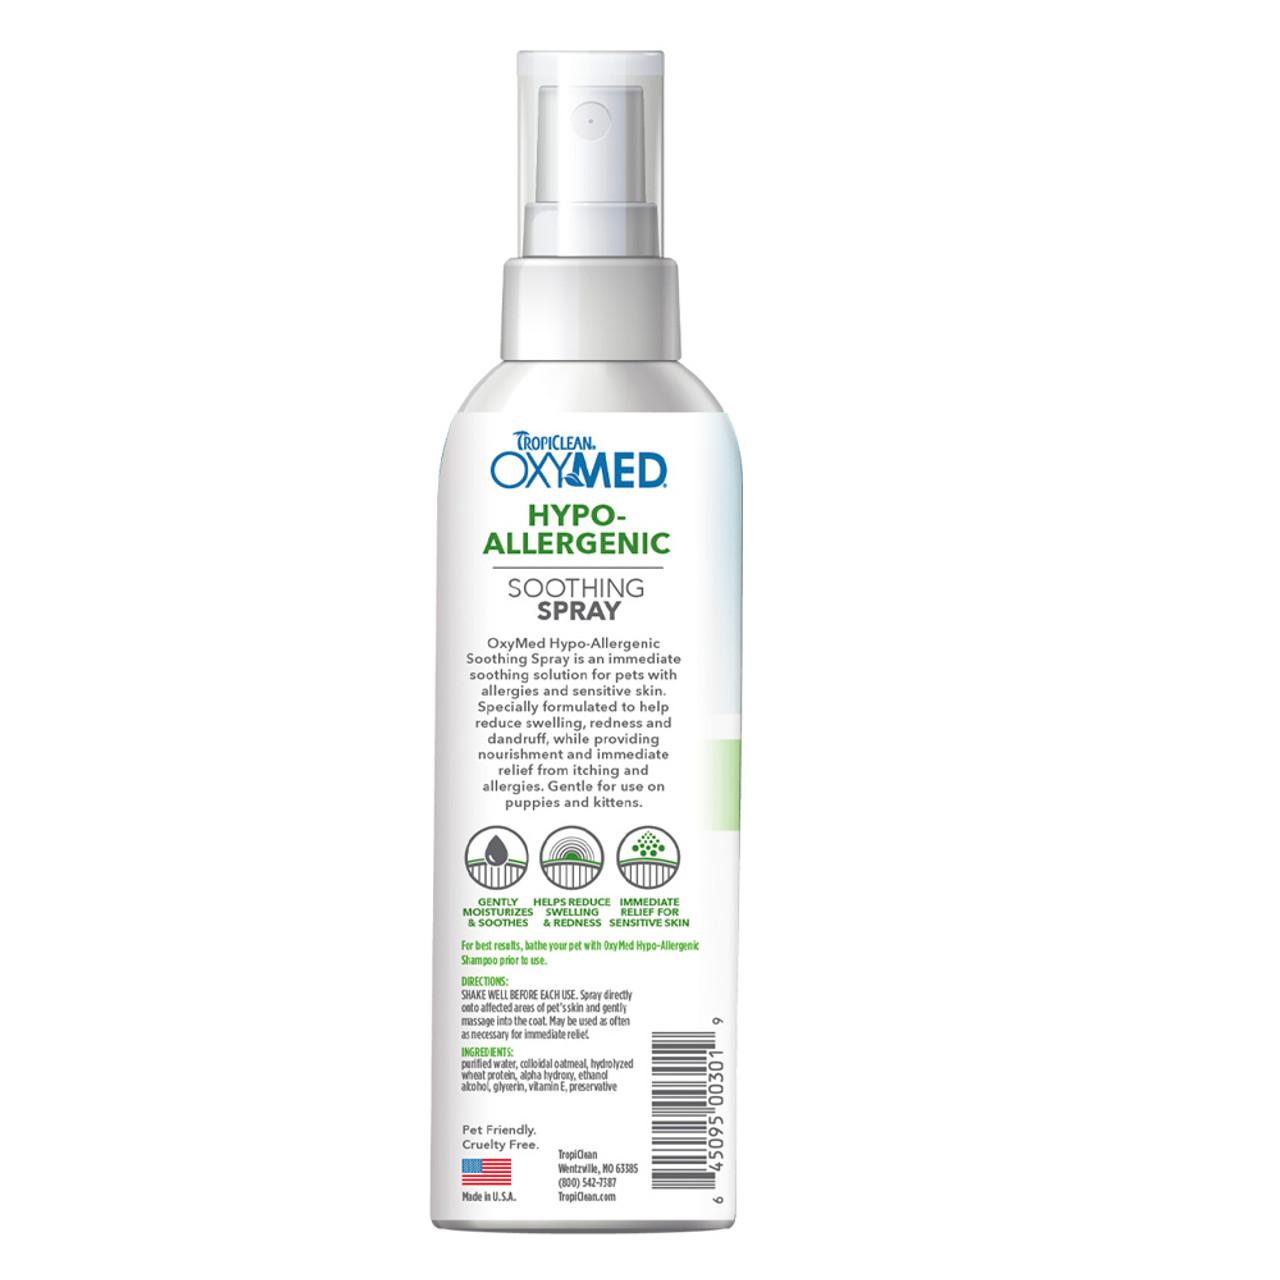 TropiClean OxyMed Hypo-Allergenic Cat & Dog Spray